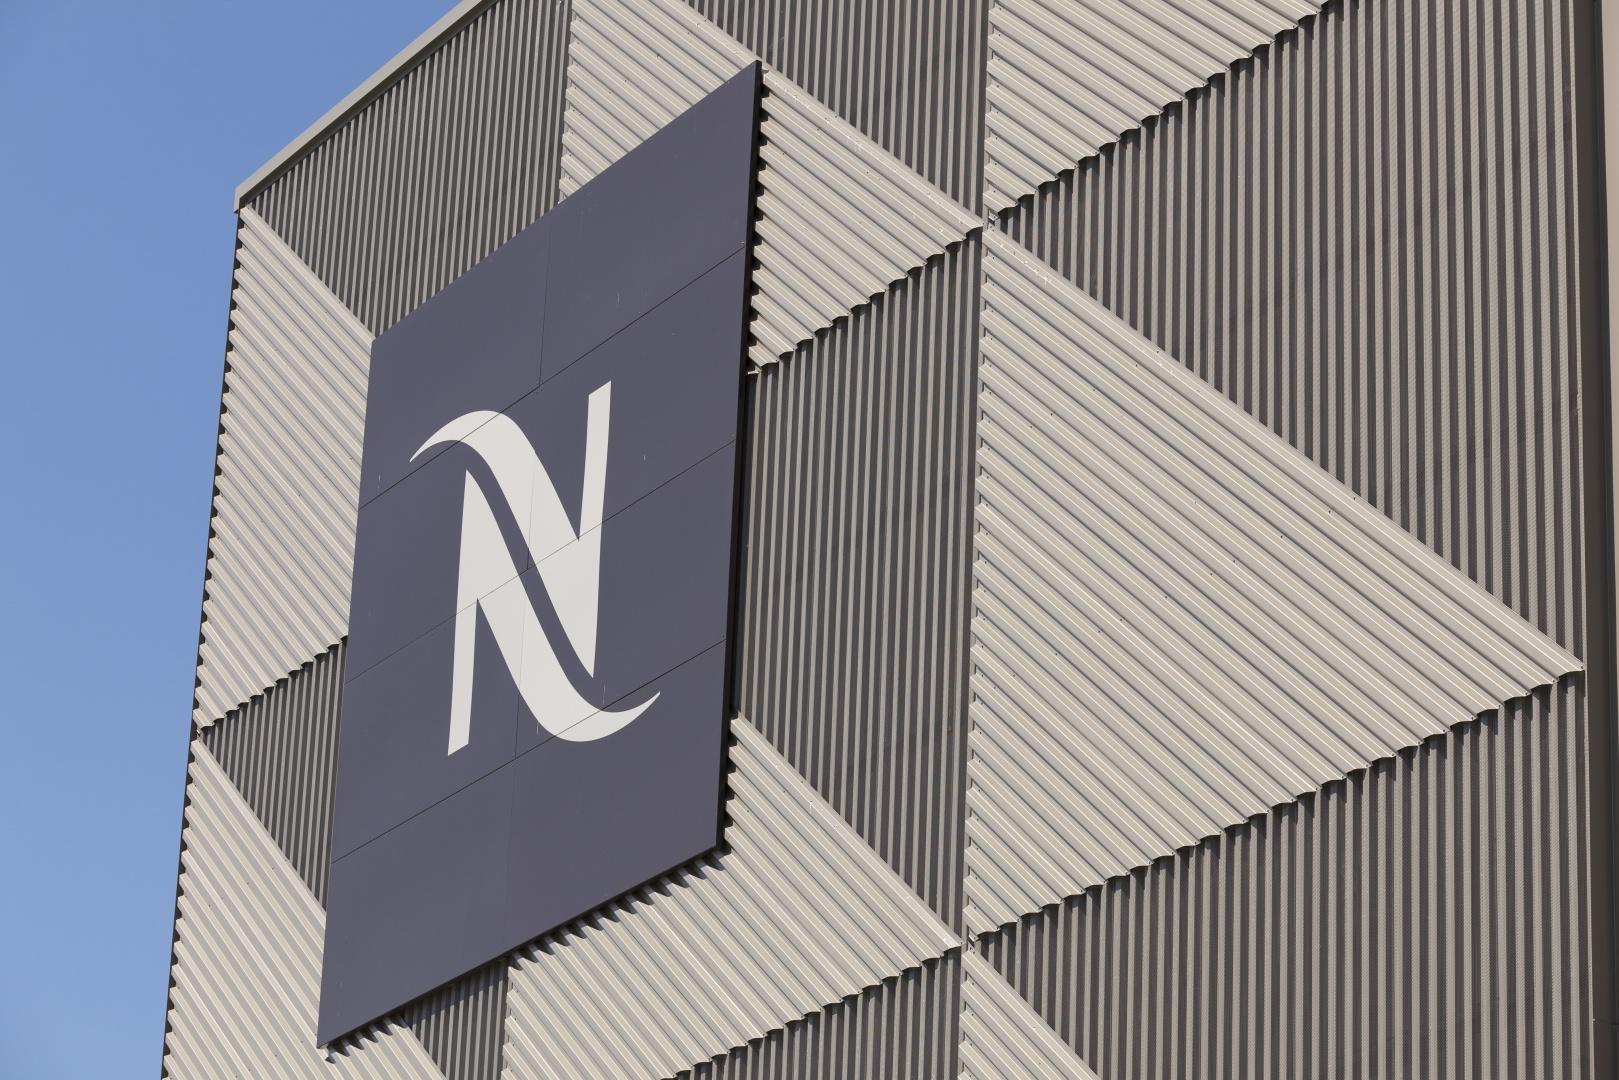 Fassade mit Nespresso-Logo © Nicolas Repond - Nespresso